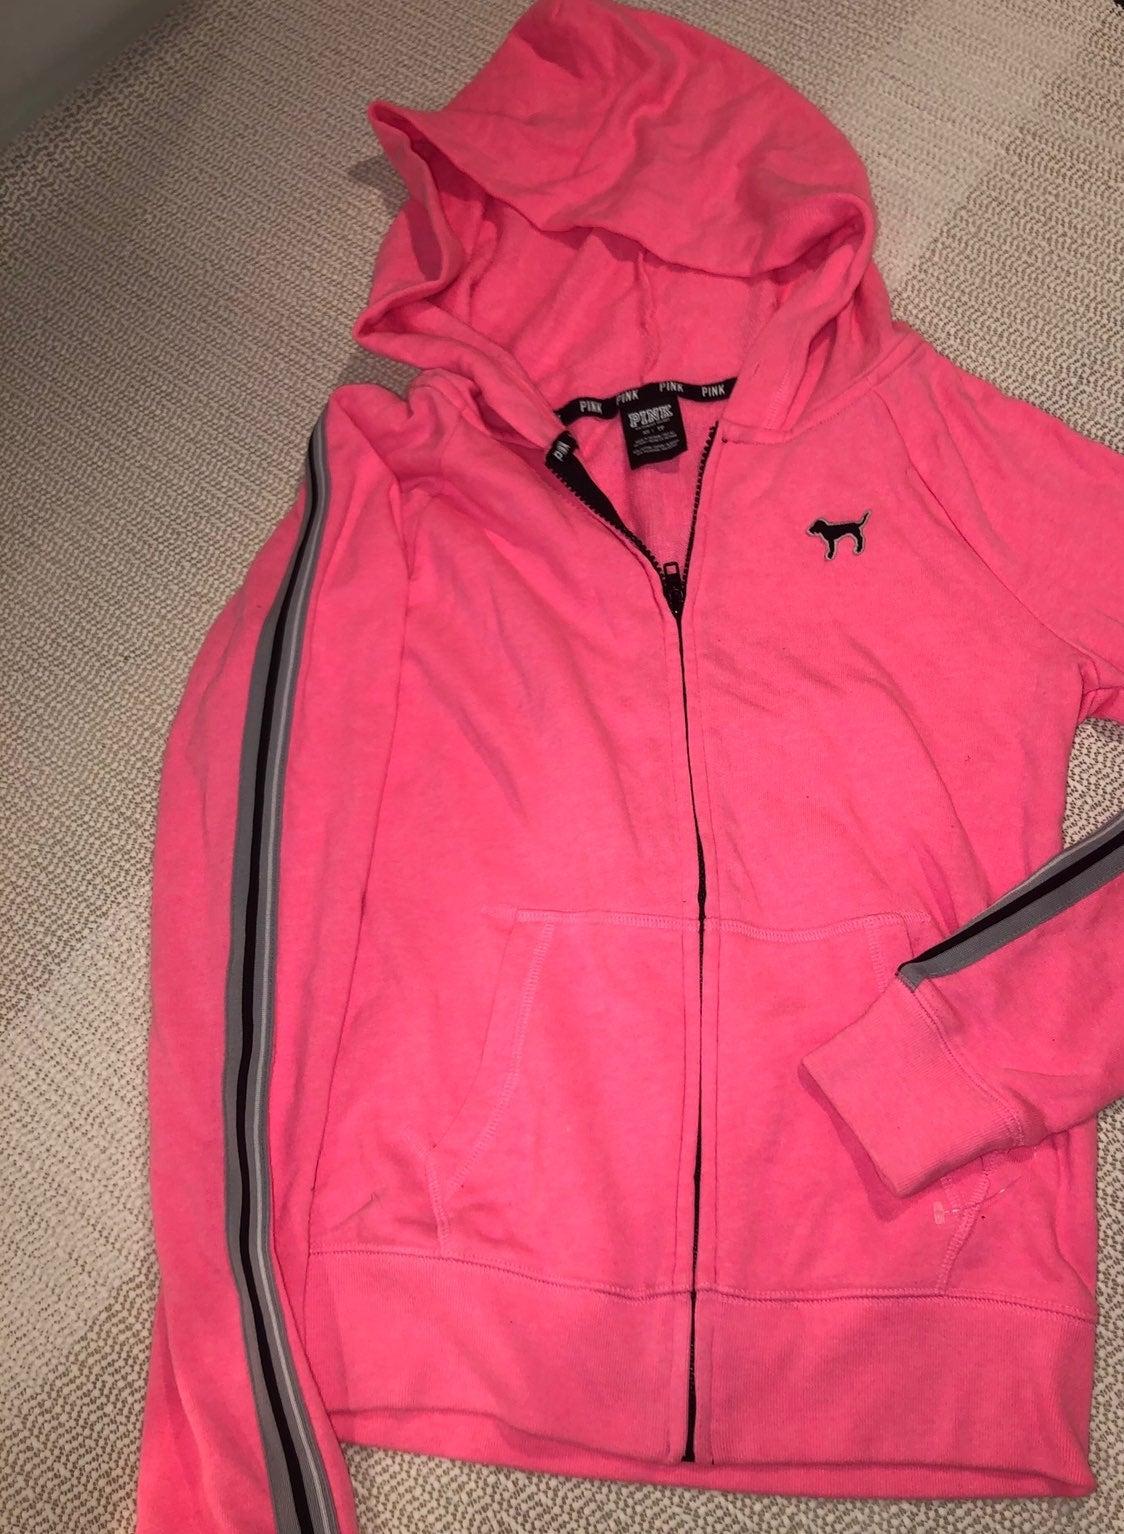 X small victorias secret pink hoodie